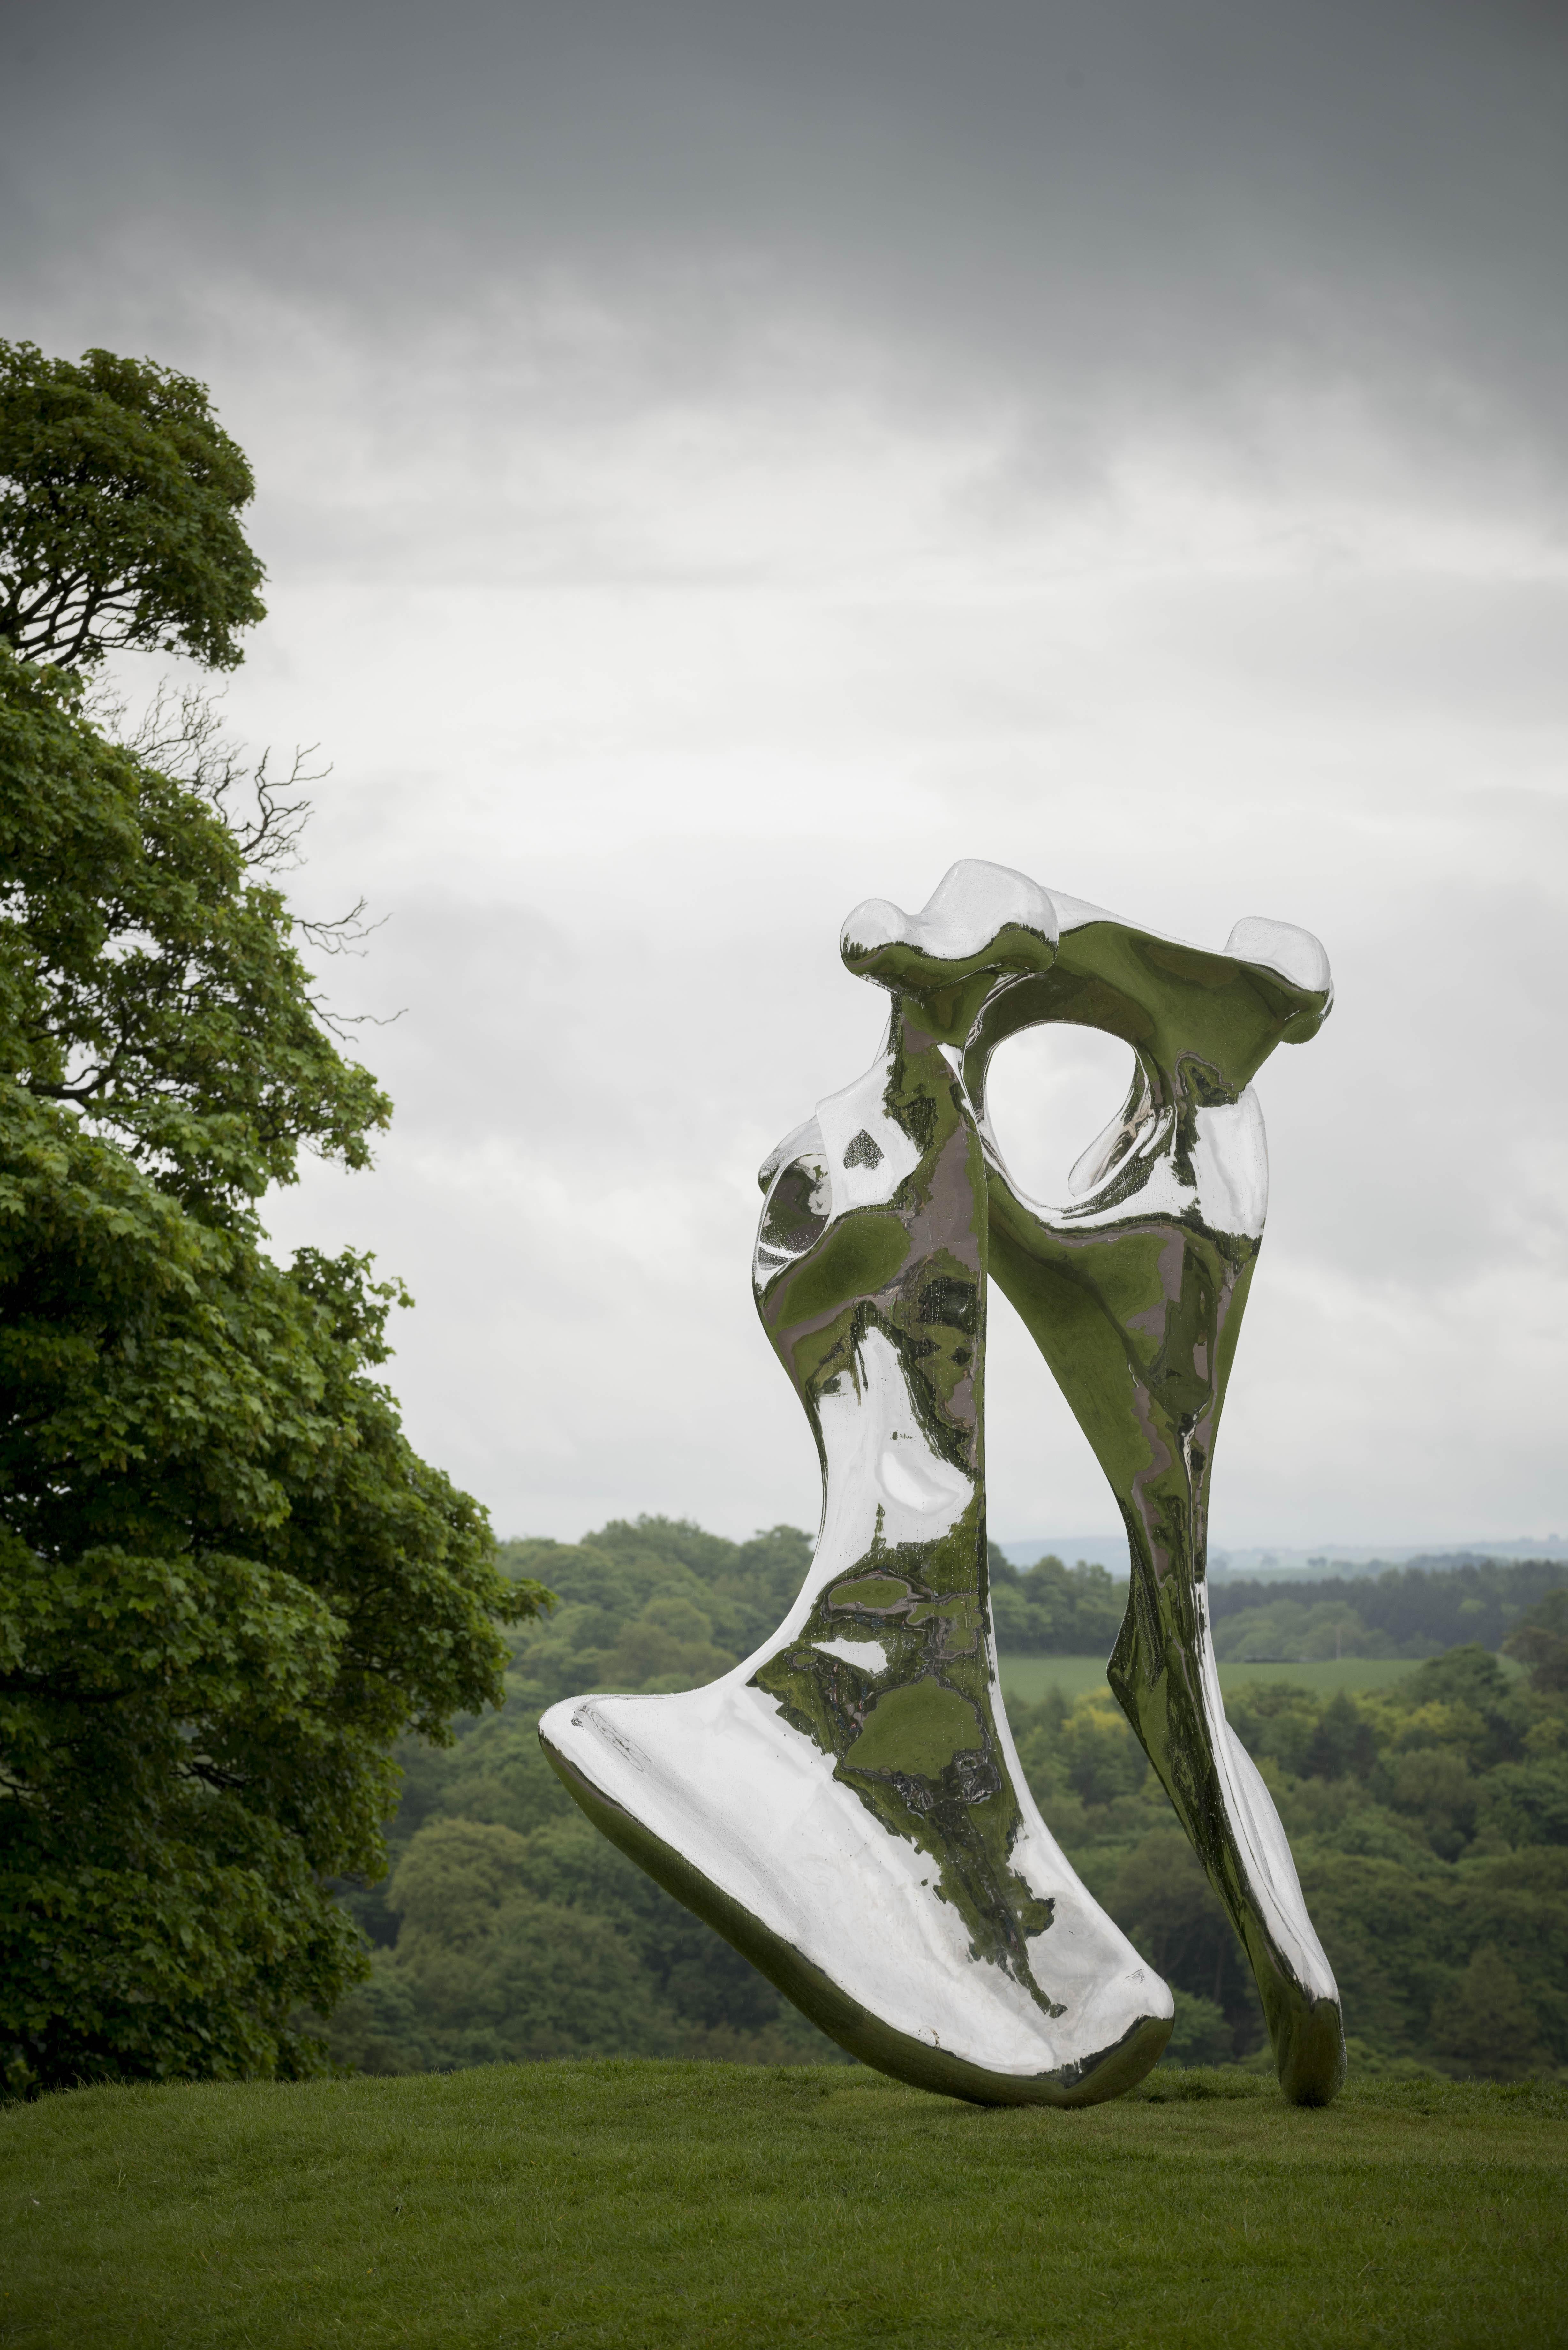 """Pelvis"" (2008) de Not Vital, acier chromé, 386 x 341 x 146 cm. Photo : Jonty Wilde."